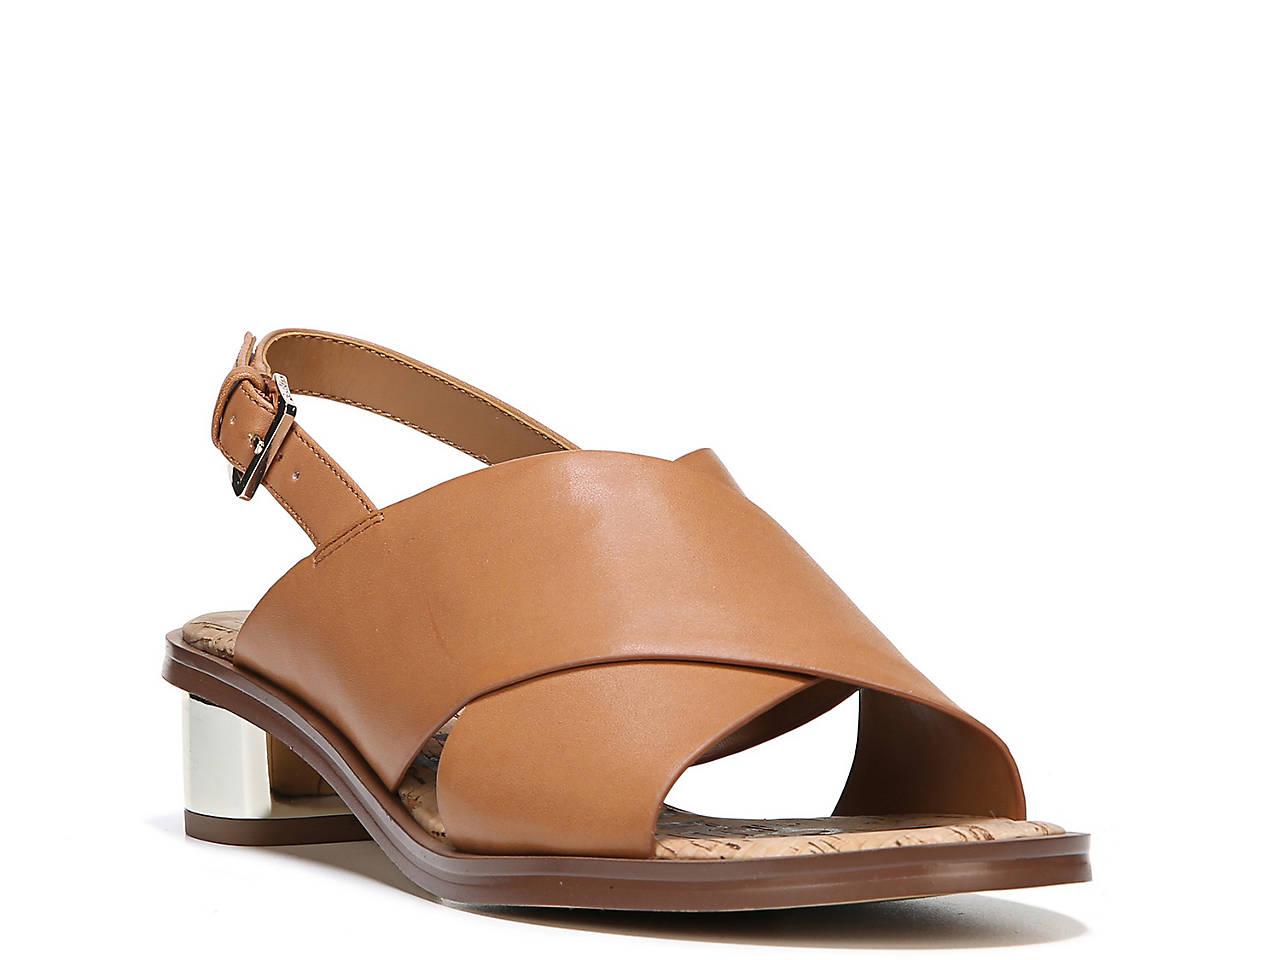 5d01e76d591a10 Sam Edelman Torin Sandal Women s Shoes